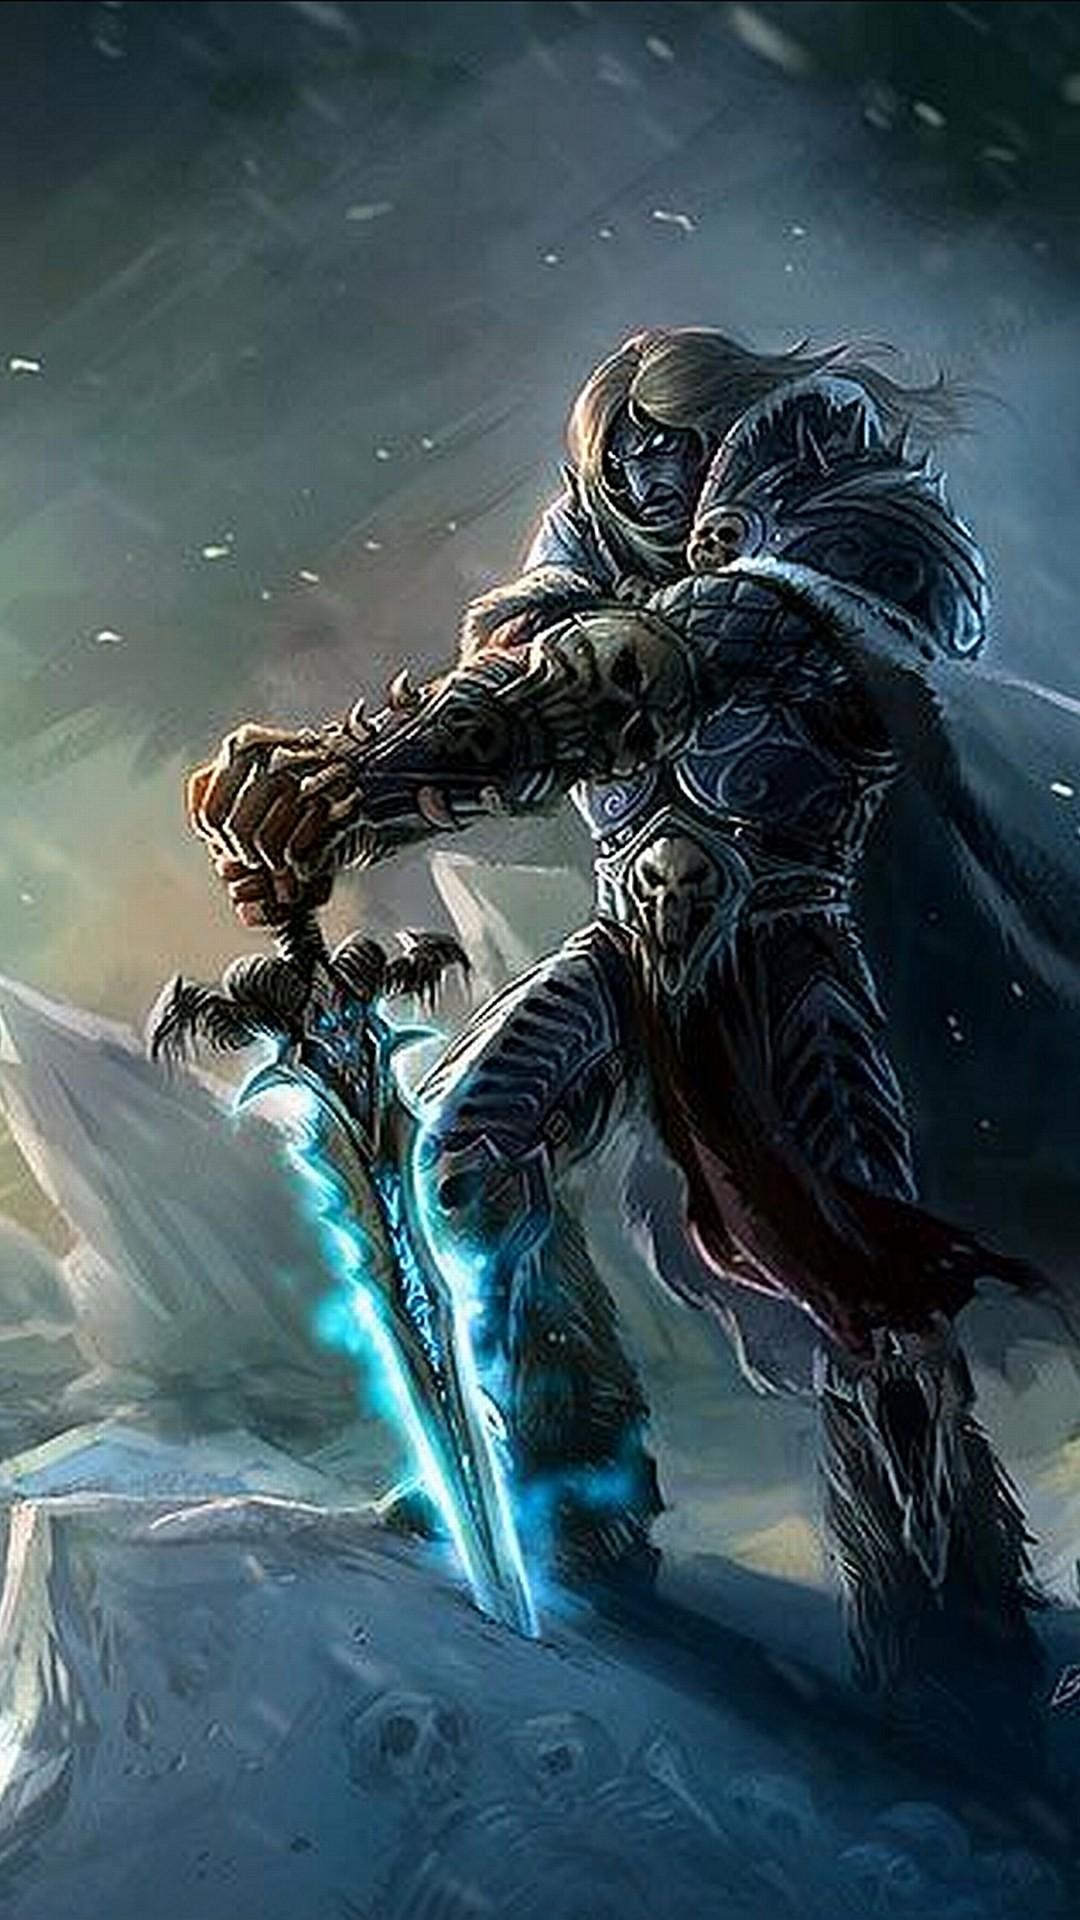 Free Warcraft Movie phone wallpaper by miszrich